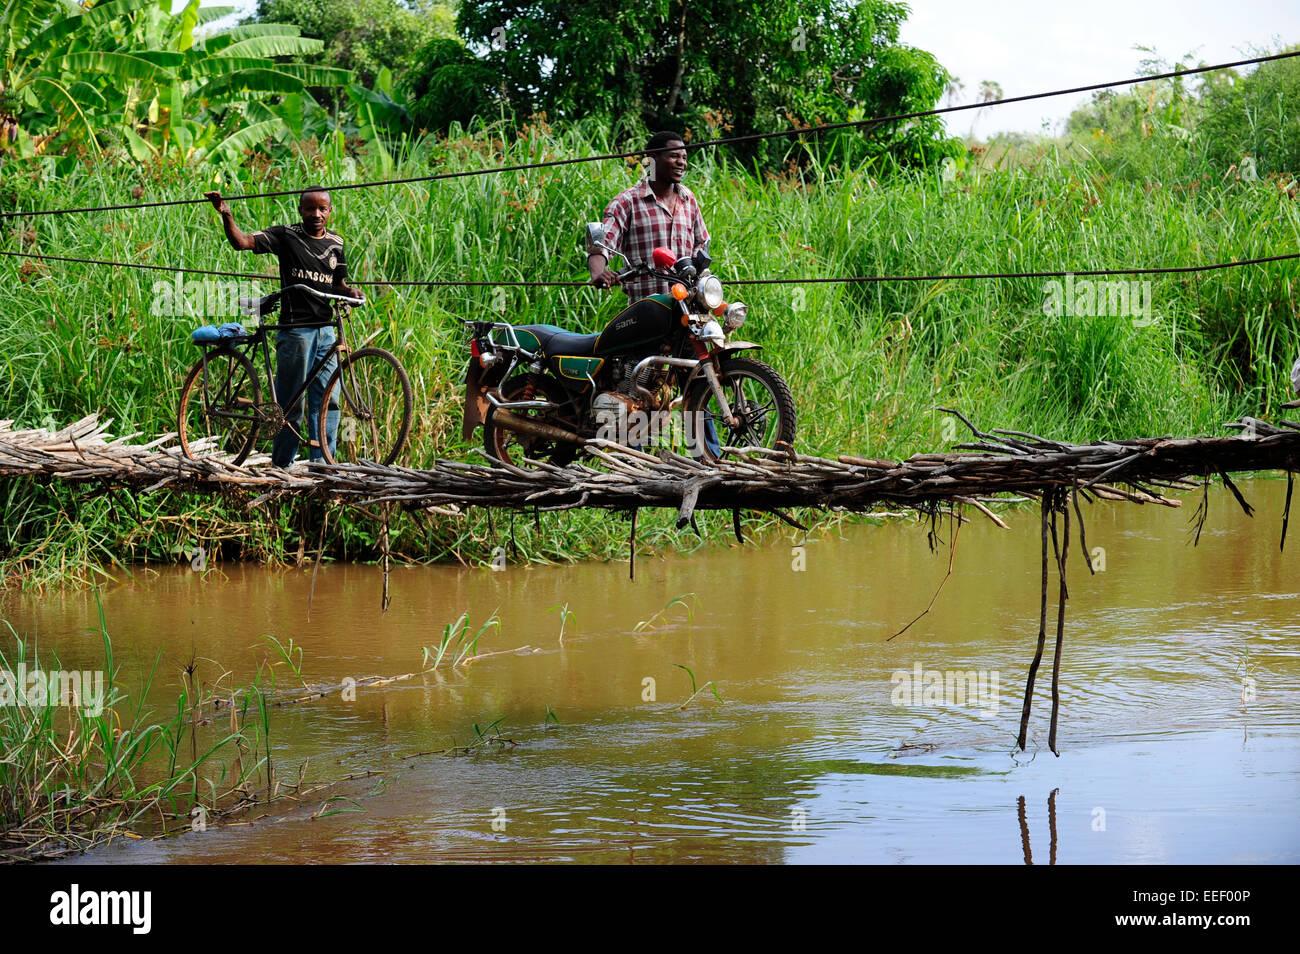 TANZANIA, Korogwe, ponte sospeso in Kwalukonge / TANZANIA, Korogwe, Haengebruecke in Kwalukonge Immagini Stock